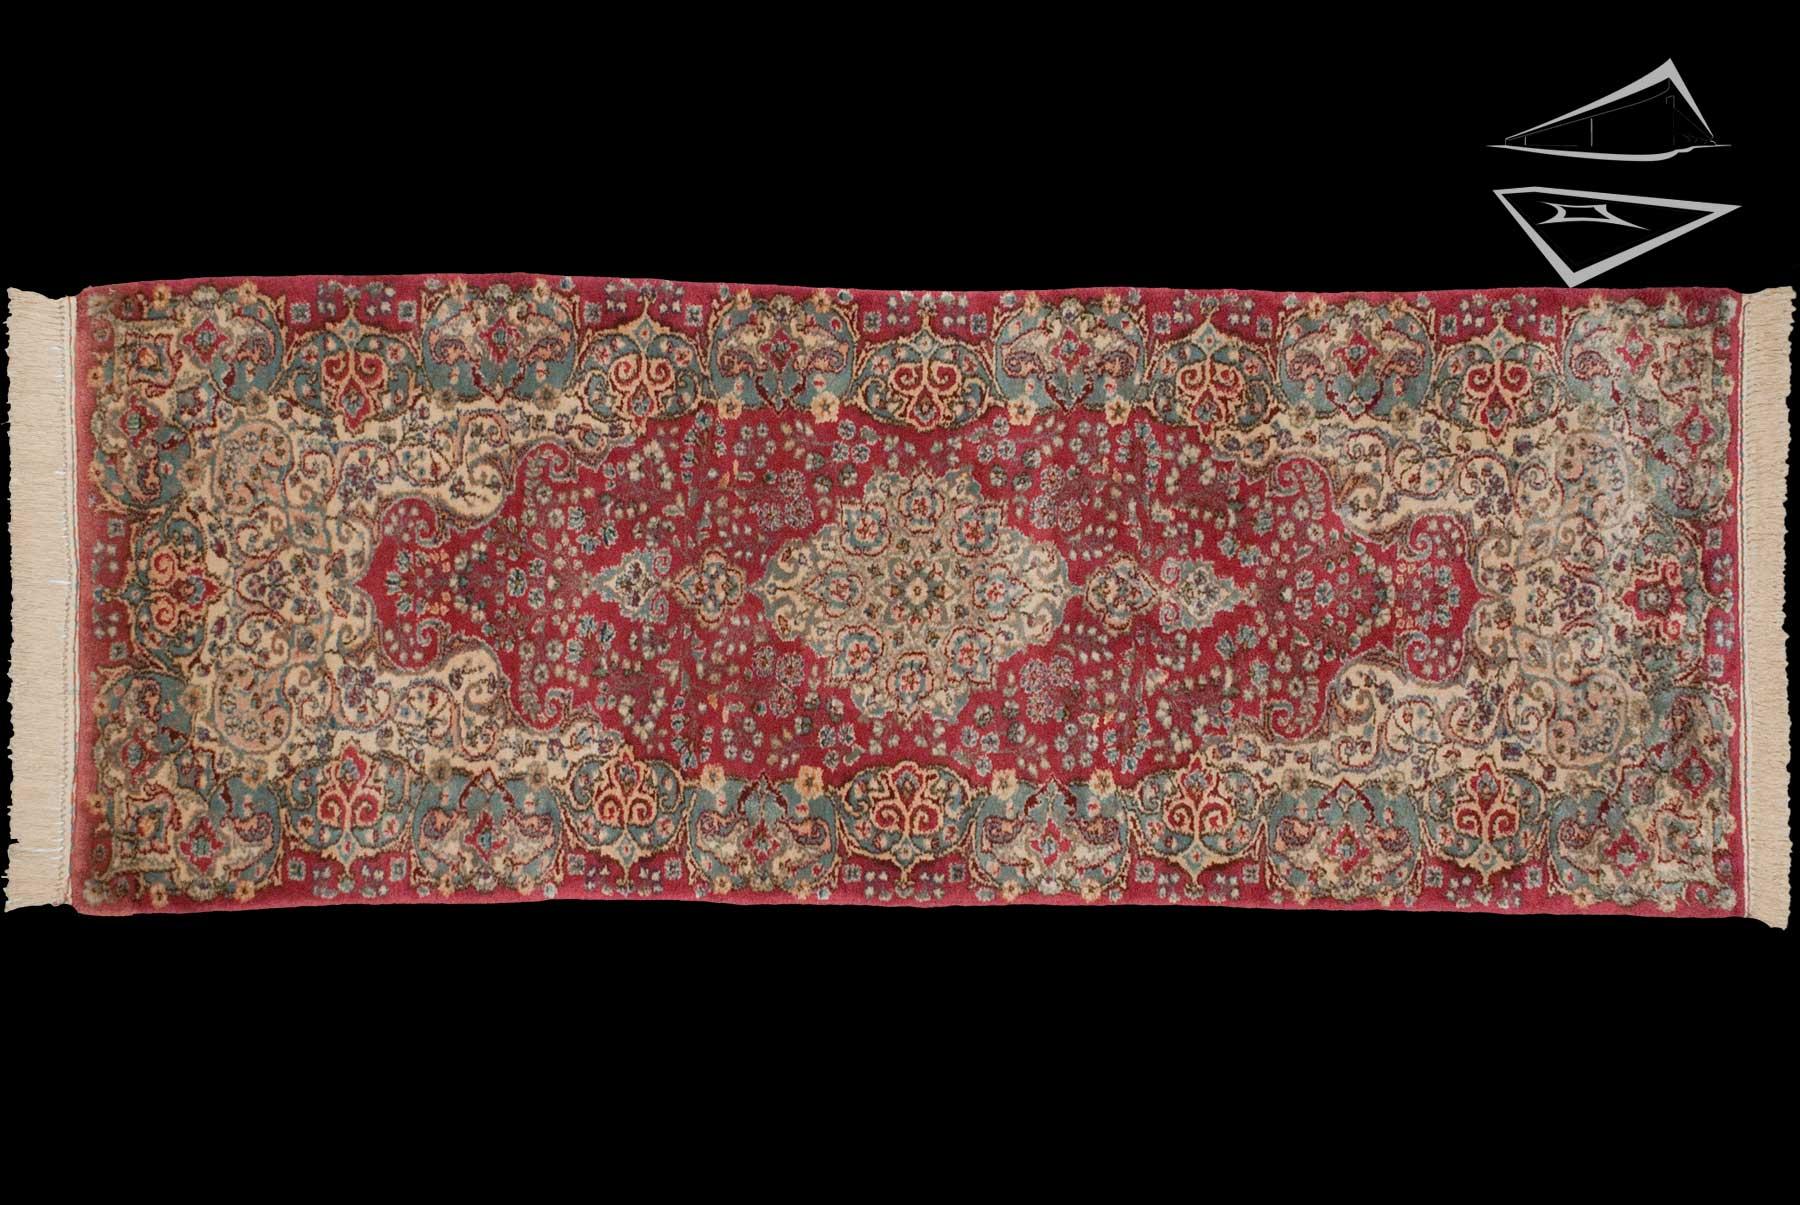 persian kerman rug runner 2 39 6 x 8 39. Black Bedroom Furniture Sets. Home Design Ideas